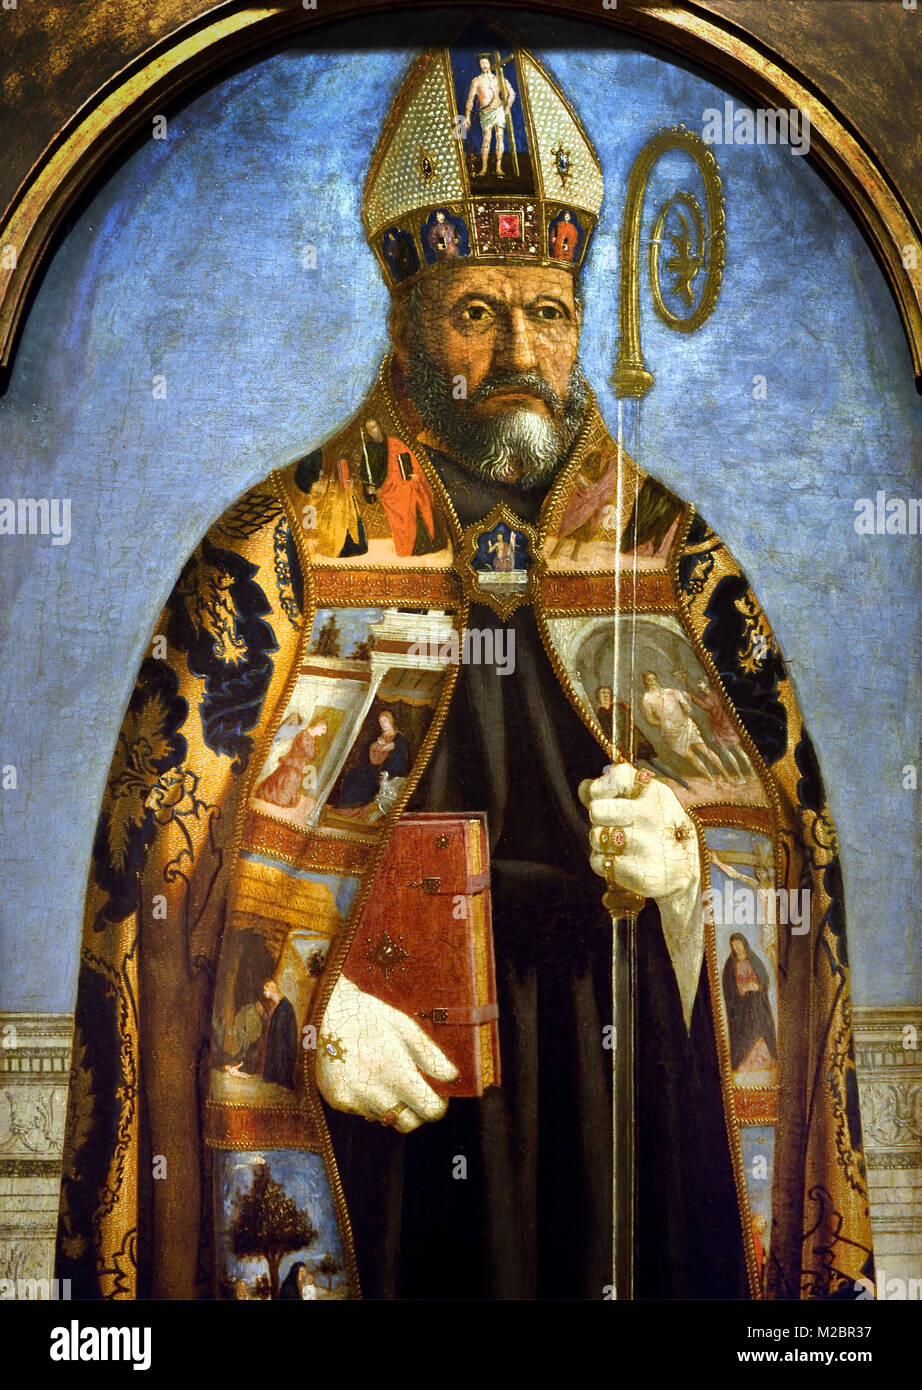 Saint Augustin 1460 Piero della Francesca 1415/20 - 1492 Italie Italien Photo Stock